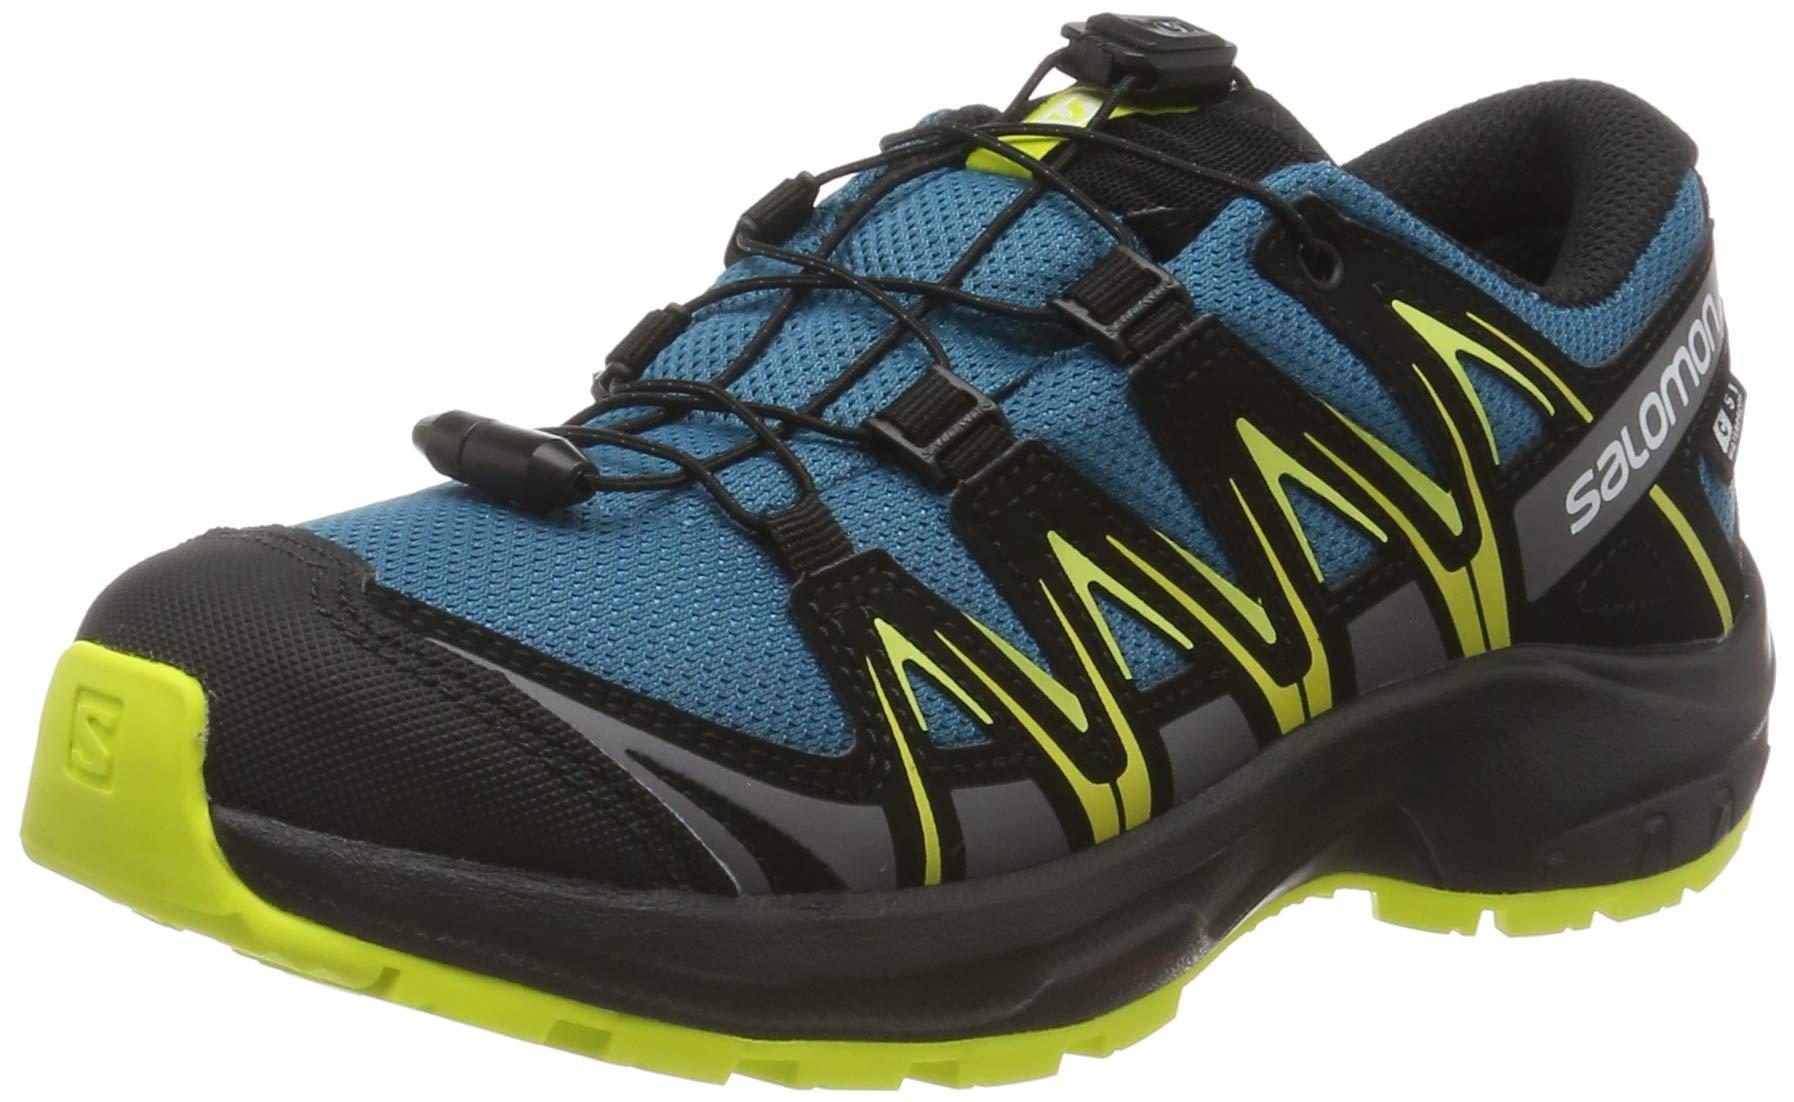 9c7ed6967b1 Salomon XA Pro 3D CSWP J, Zapatillas de Trail Running para Niños